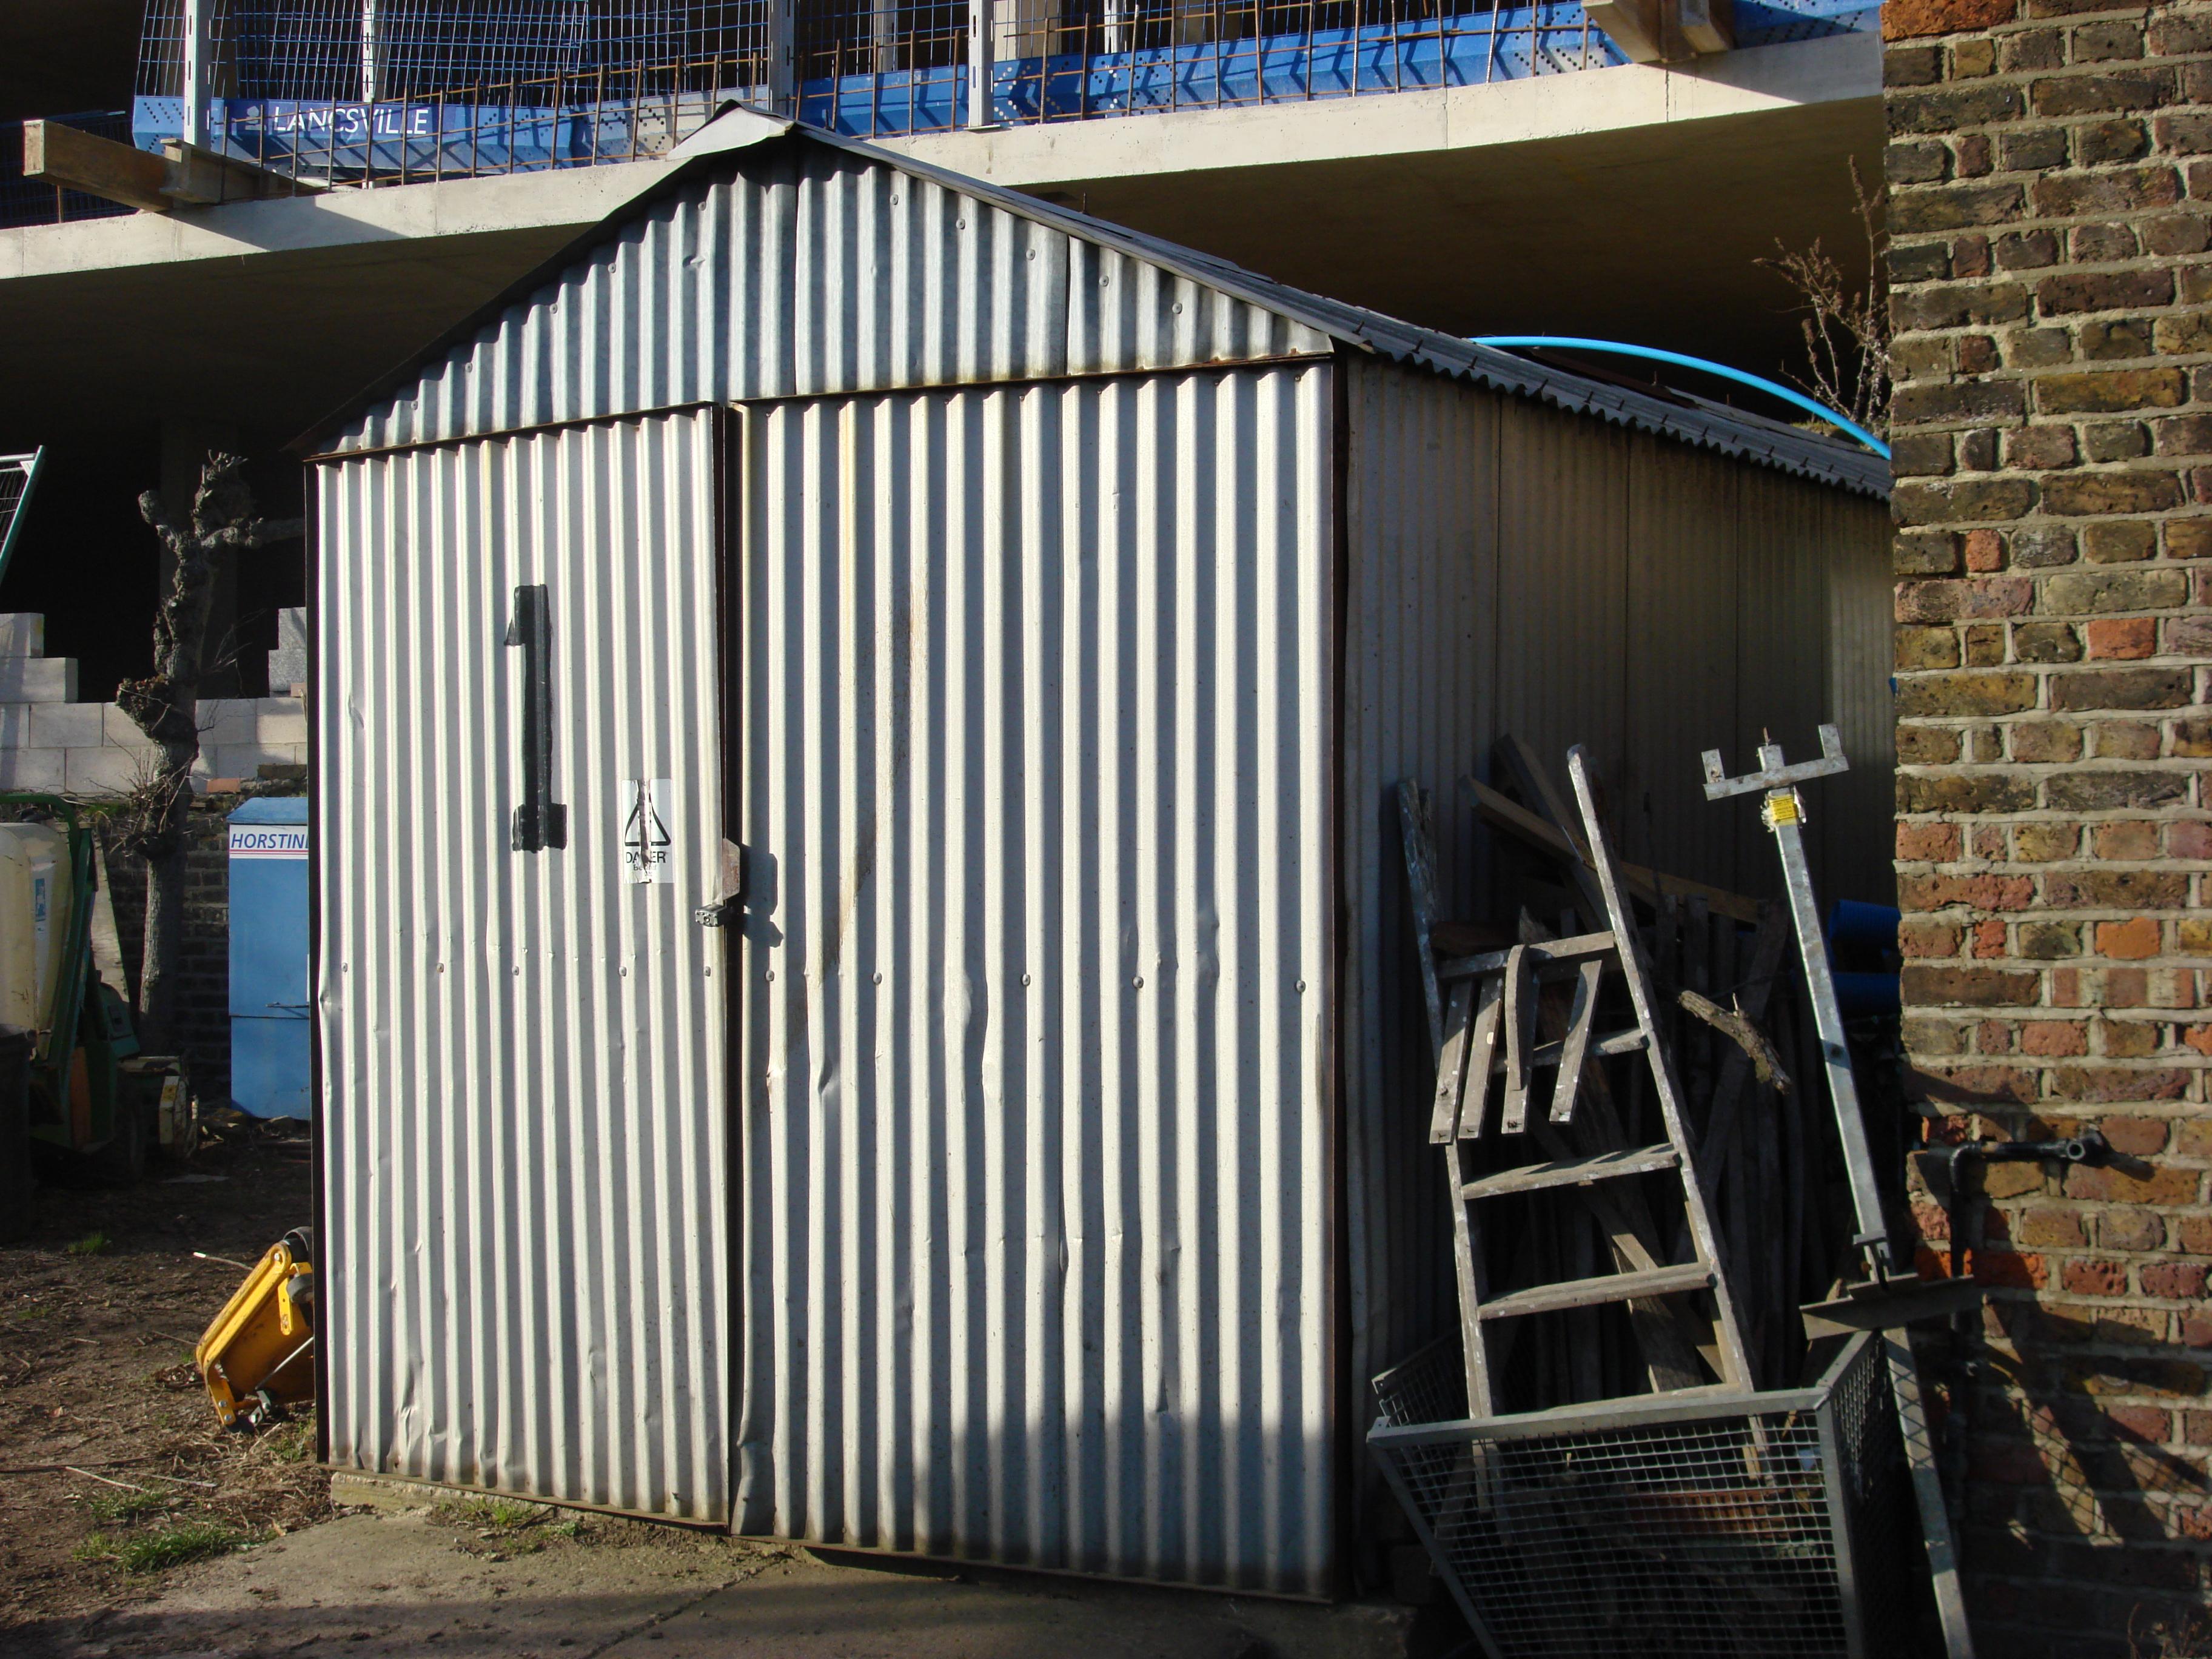 File Corrugated Iron Shed Jpg Wikimedia Commons